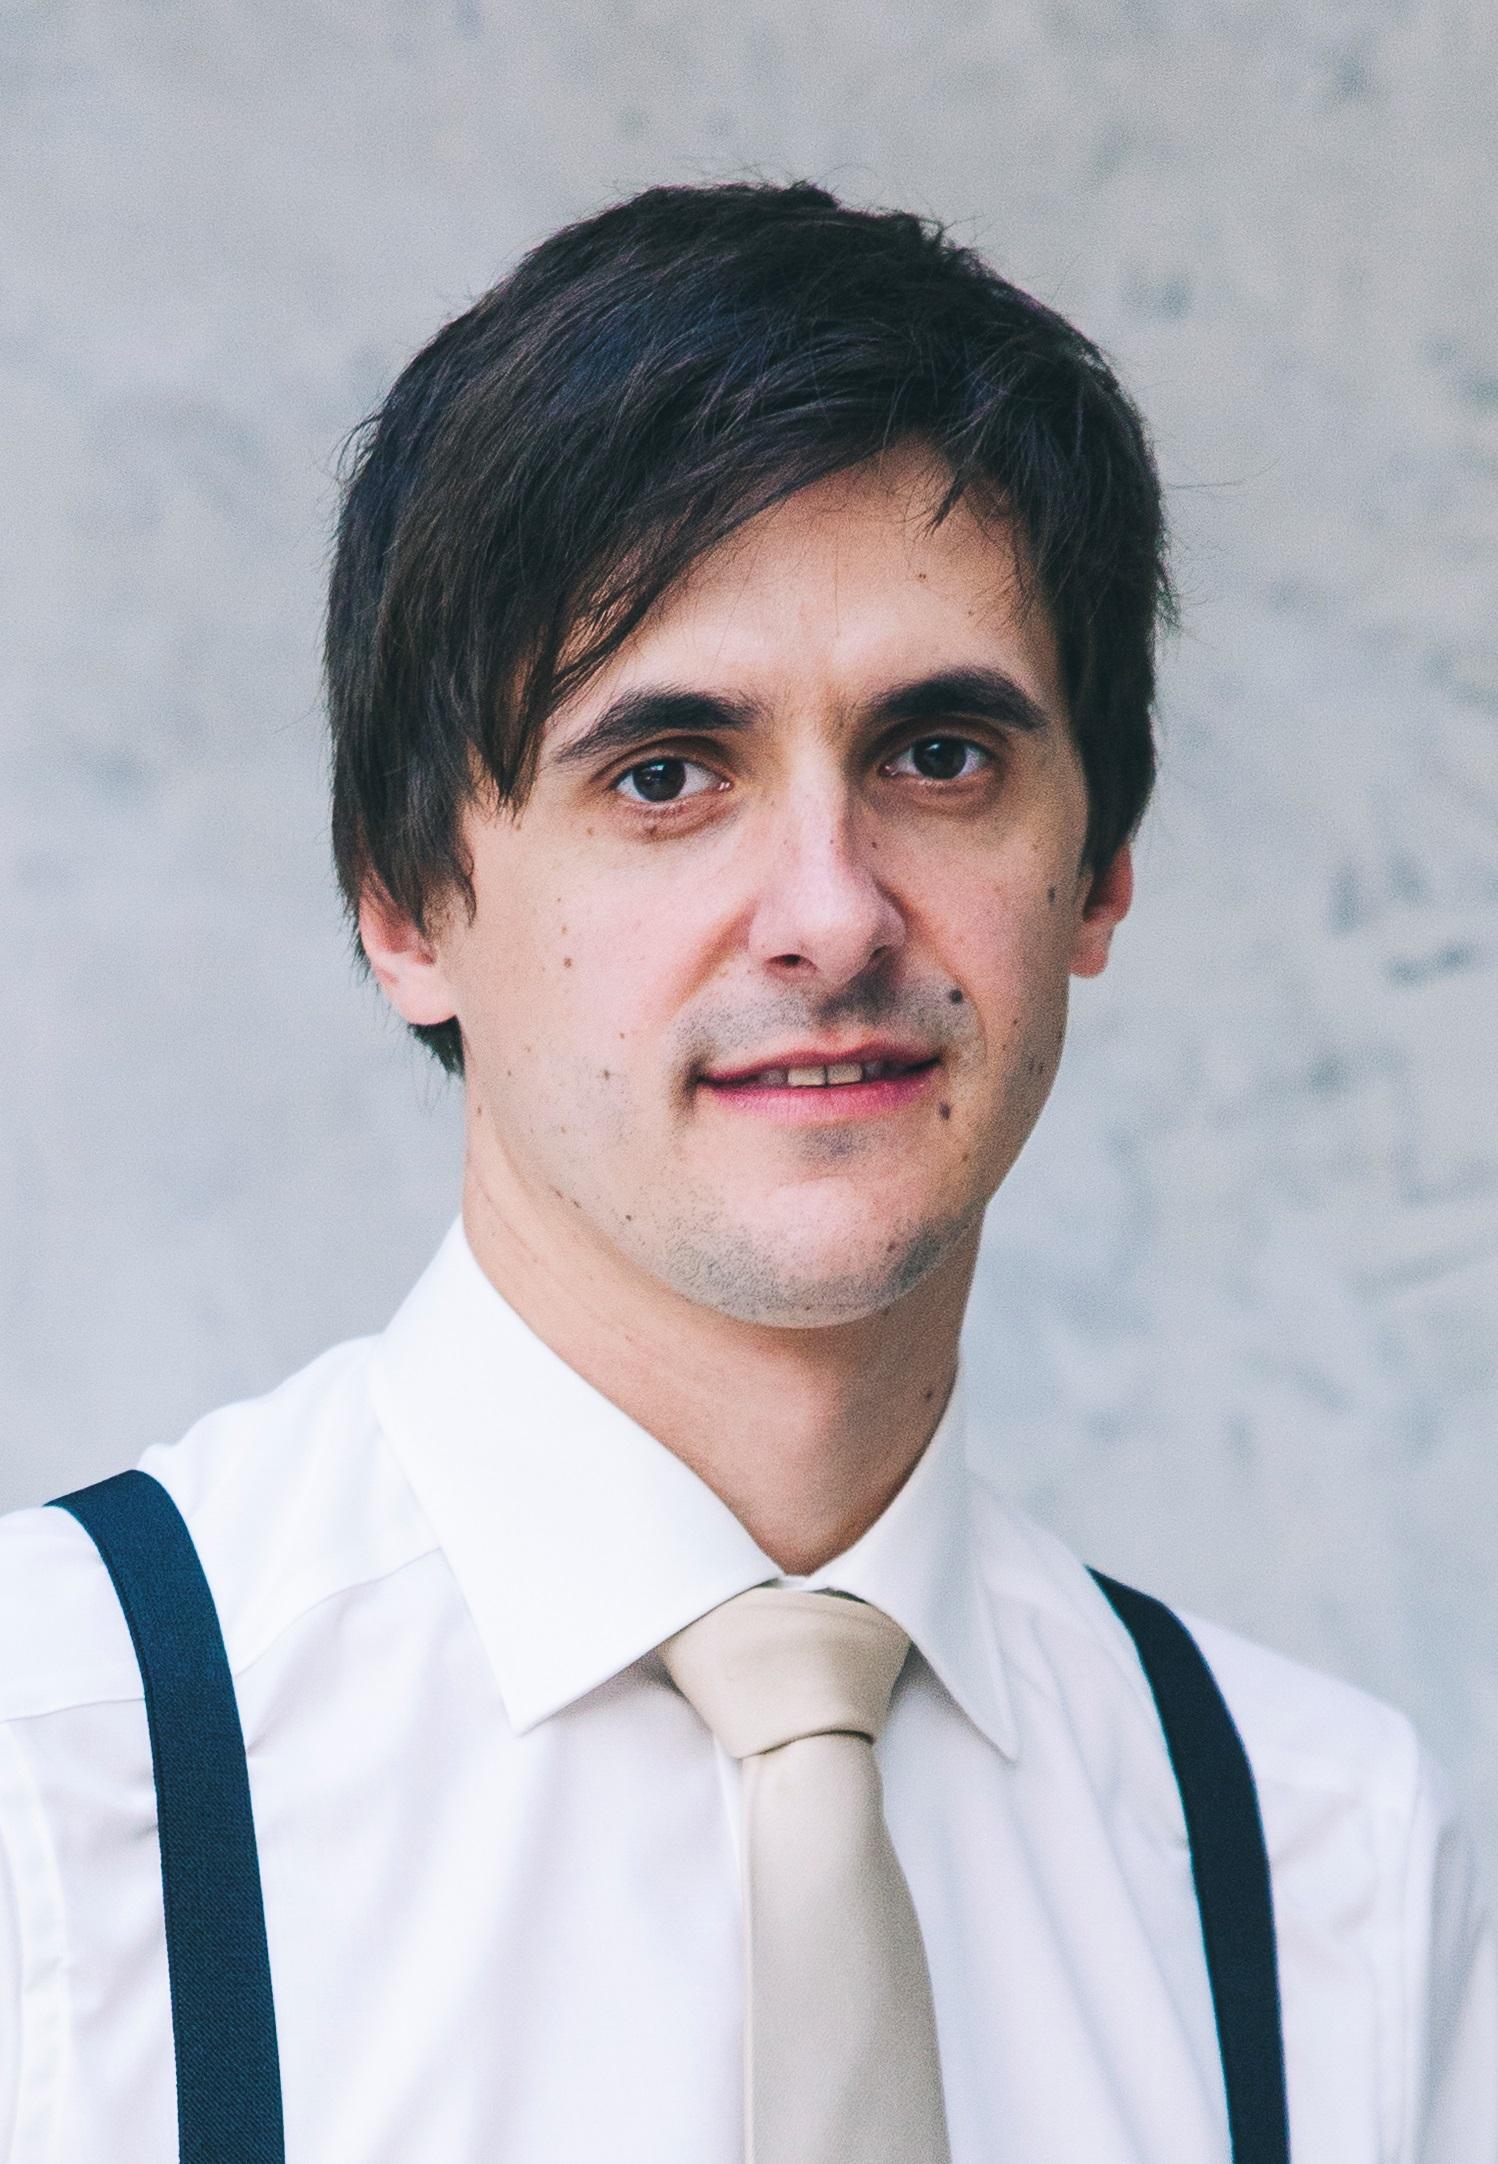 Jan Kuchyňka